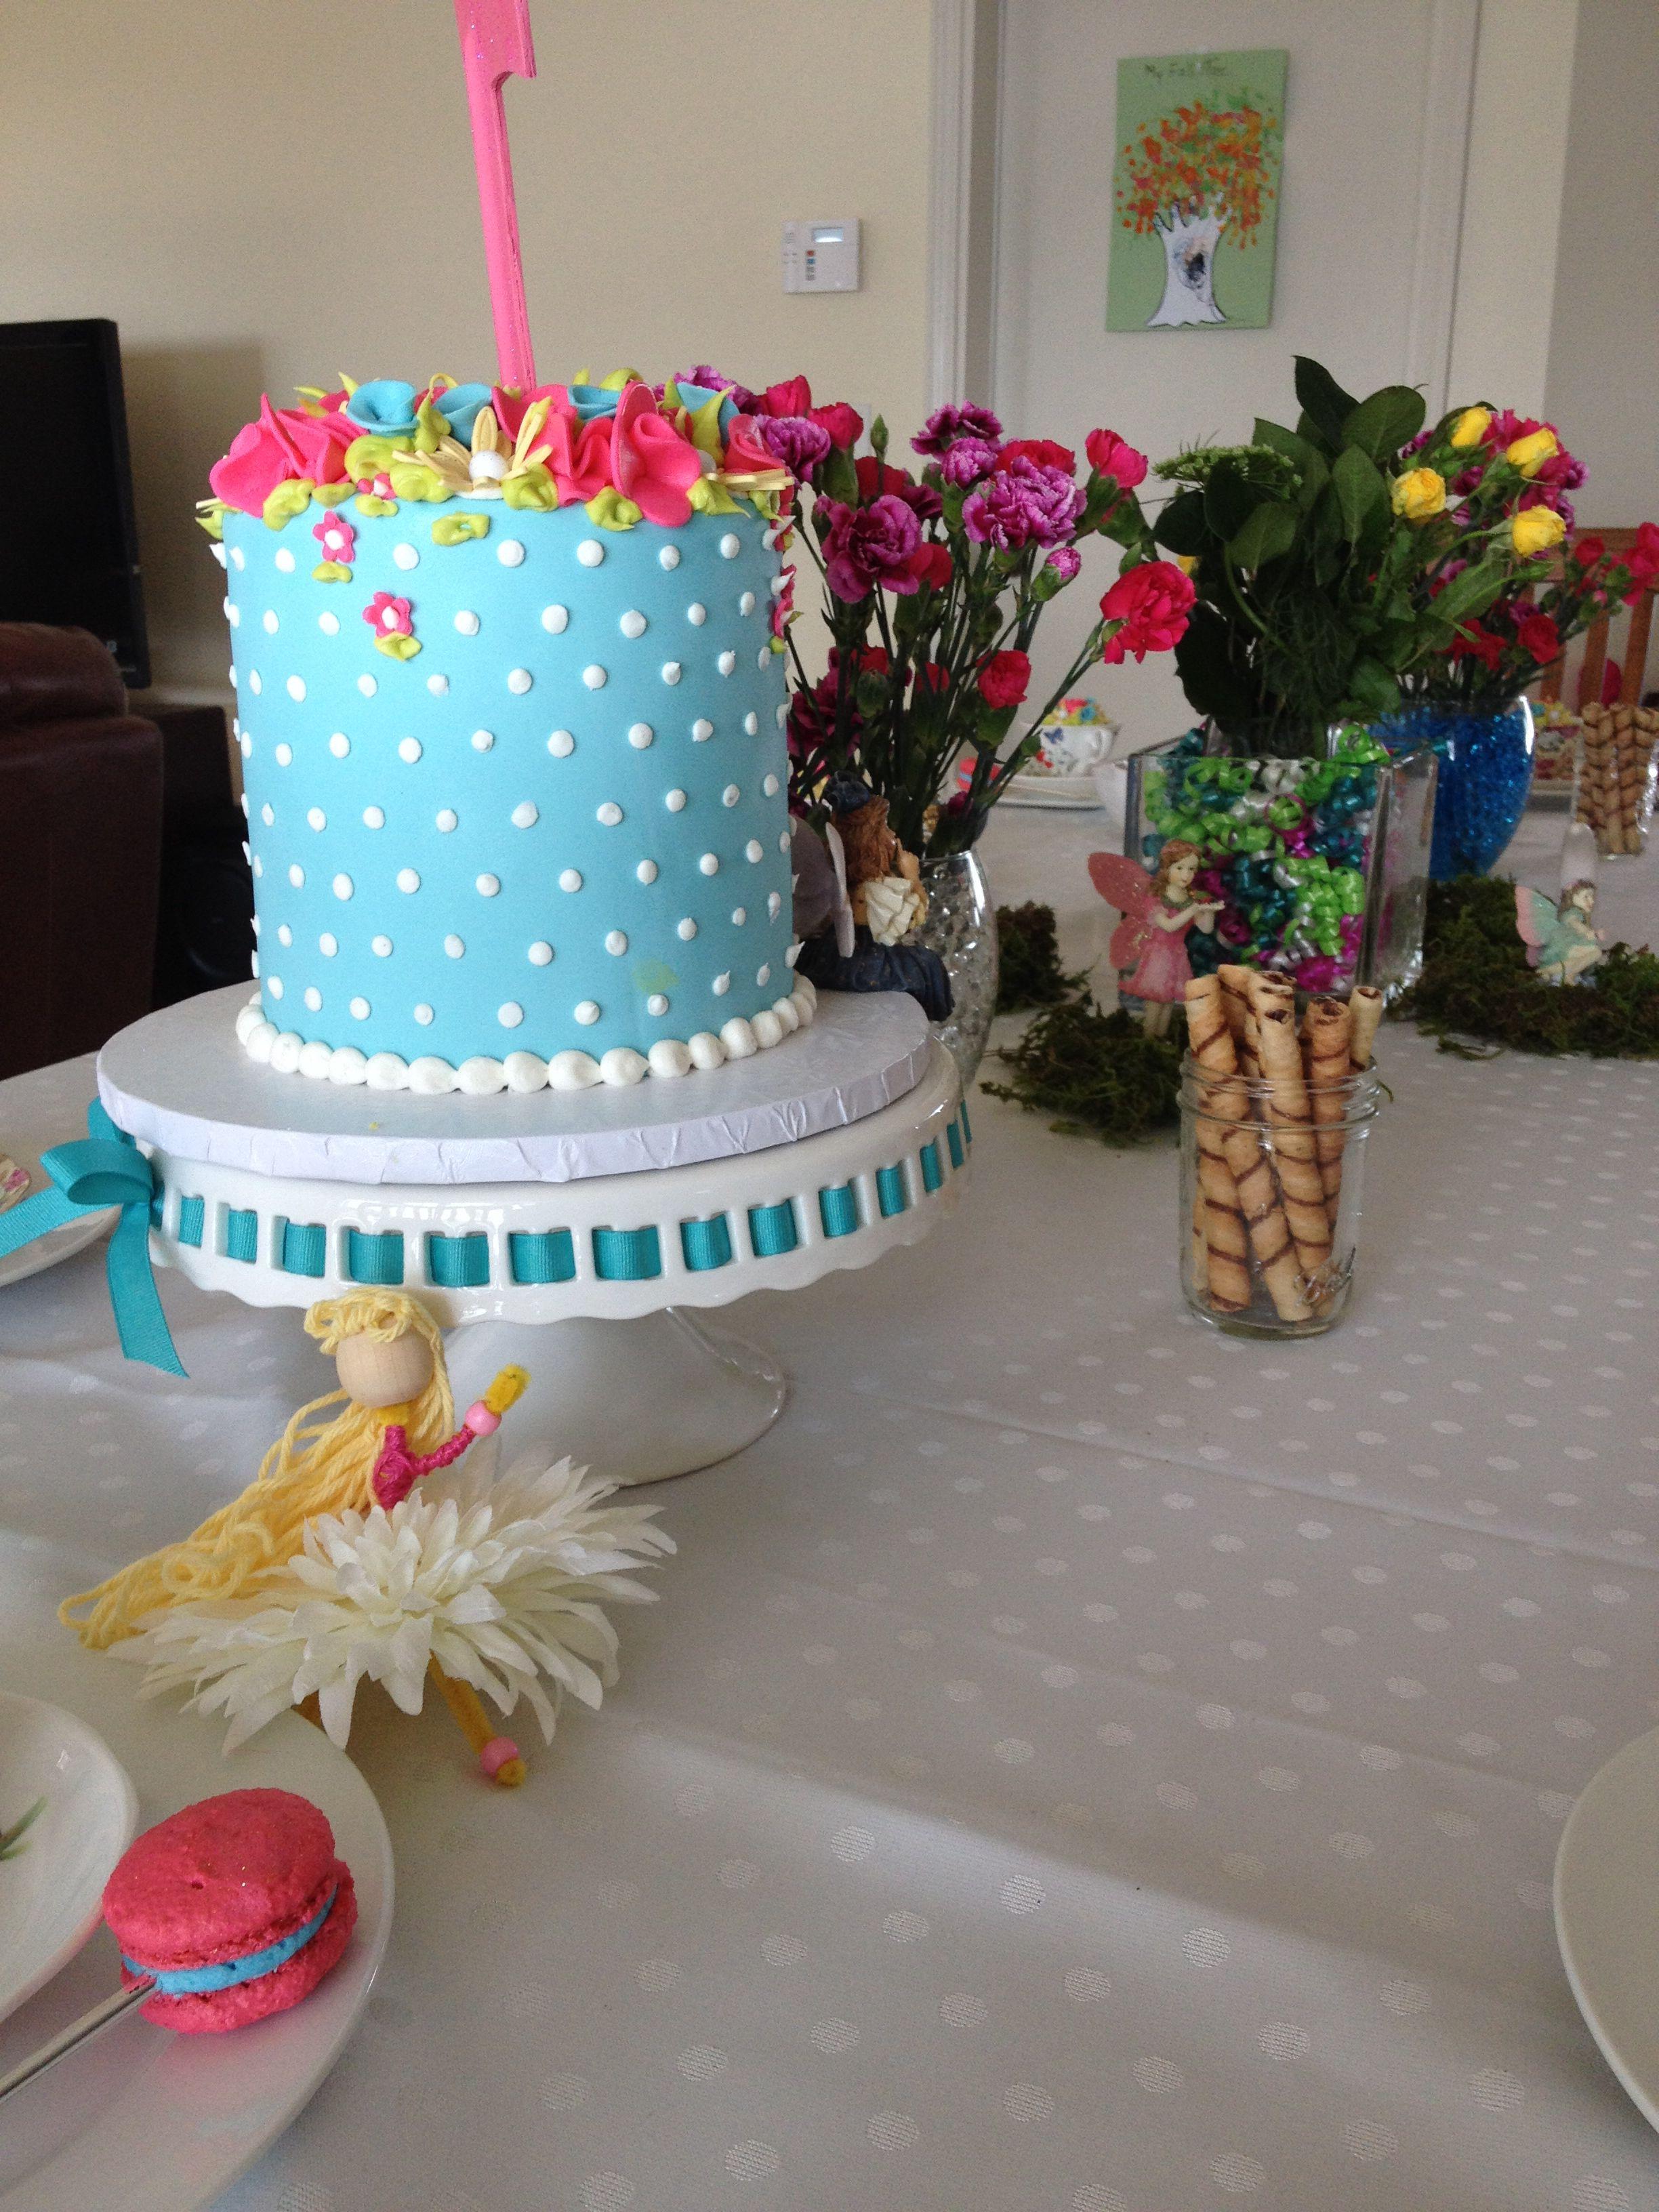 Fairy Cake Table Setting Tea Party Birthday 7th